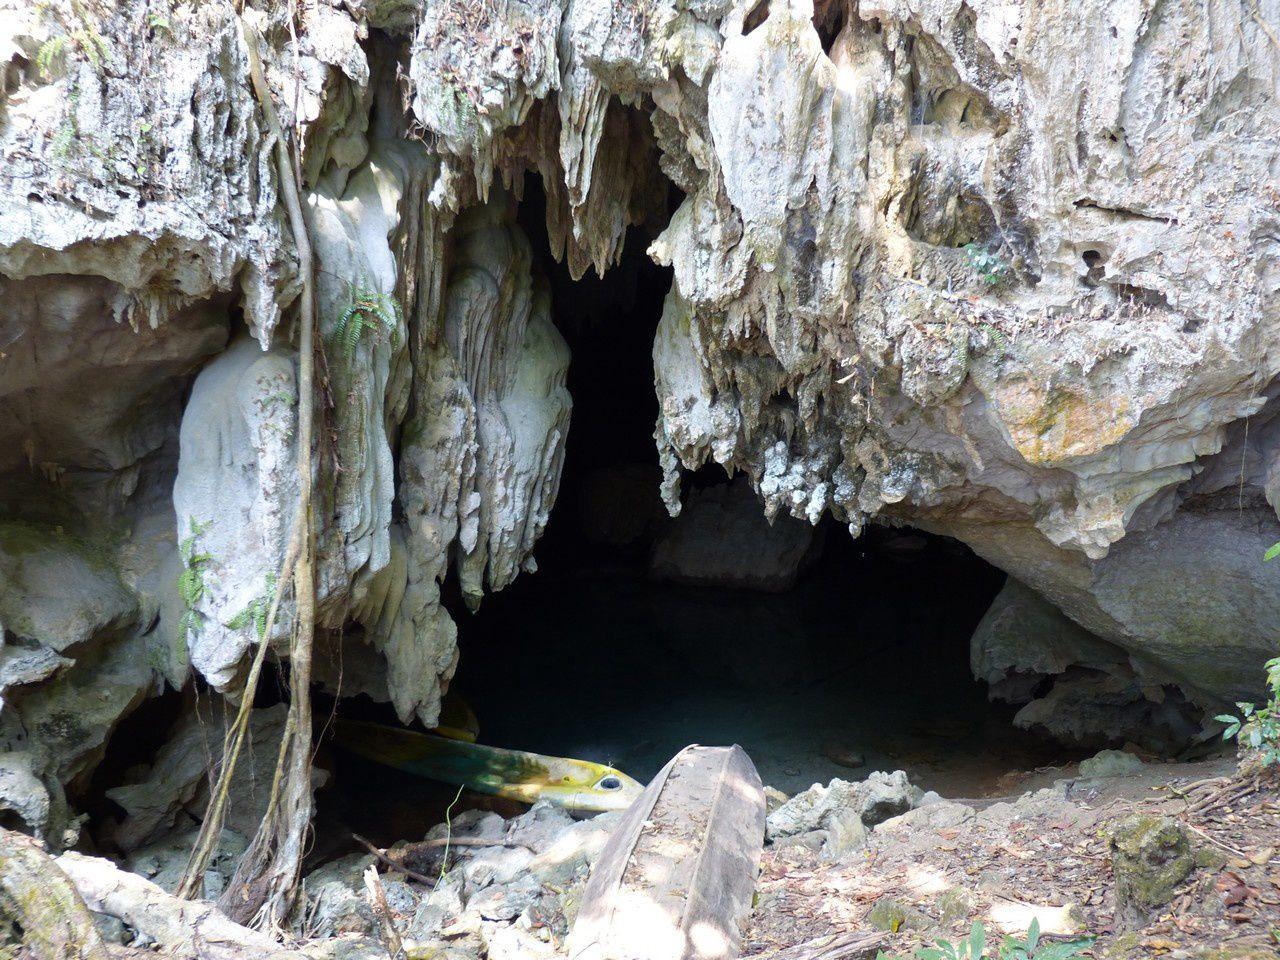 4000 îles, Thakhek et Konglor : Mère Nature dans toute sa splendeur !!